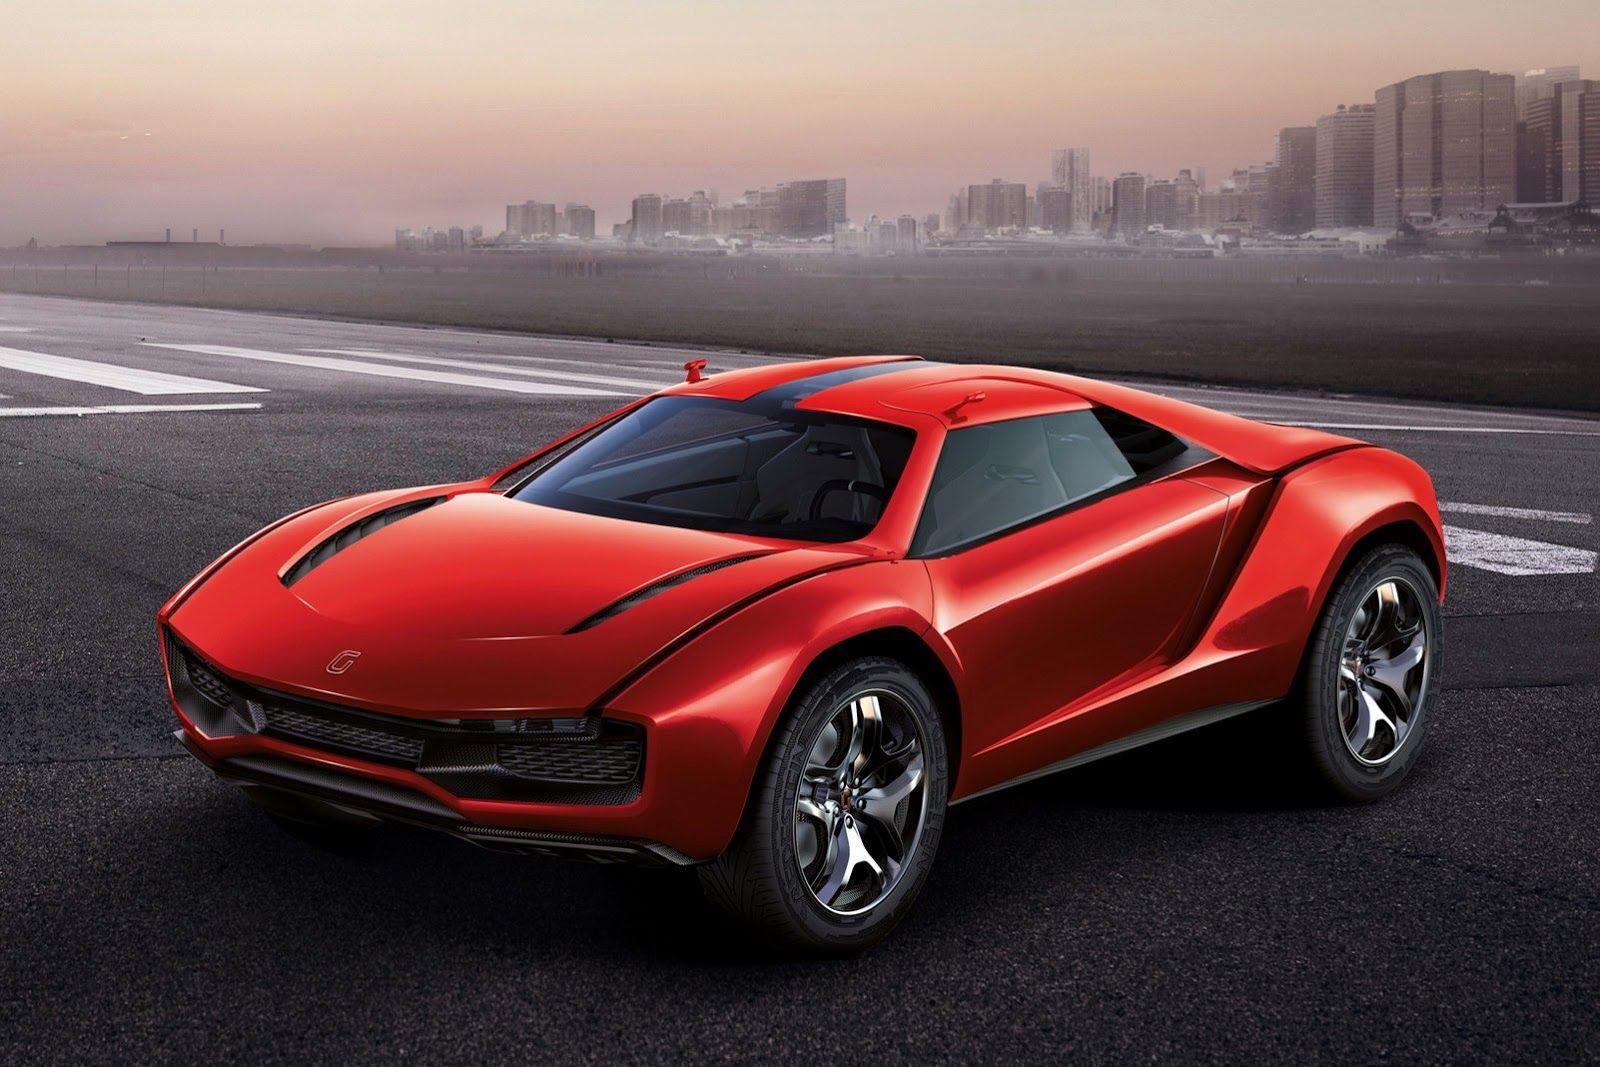 Italodesign Giugiaro Parcour Supercar Suv Concept Cars Super Cars Car